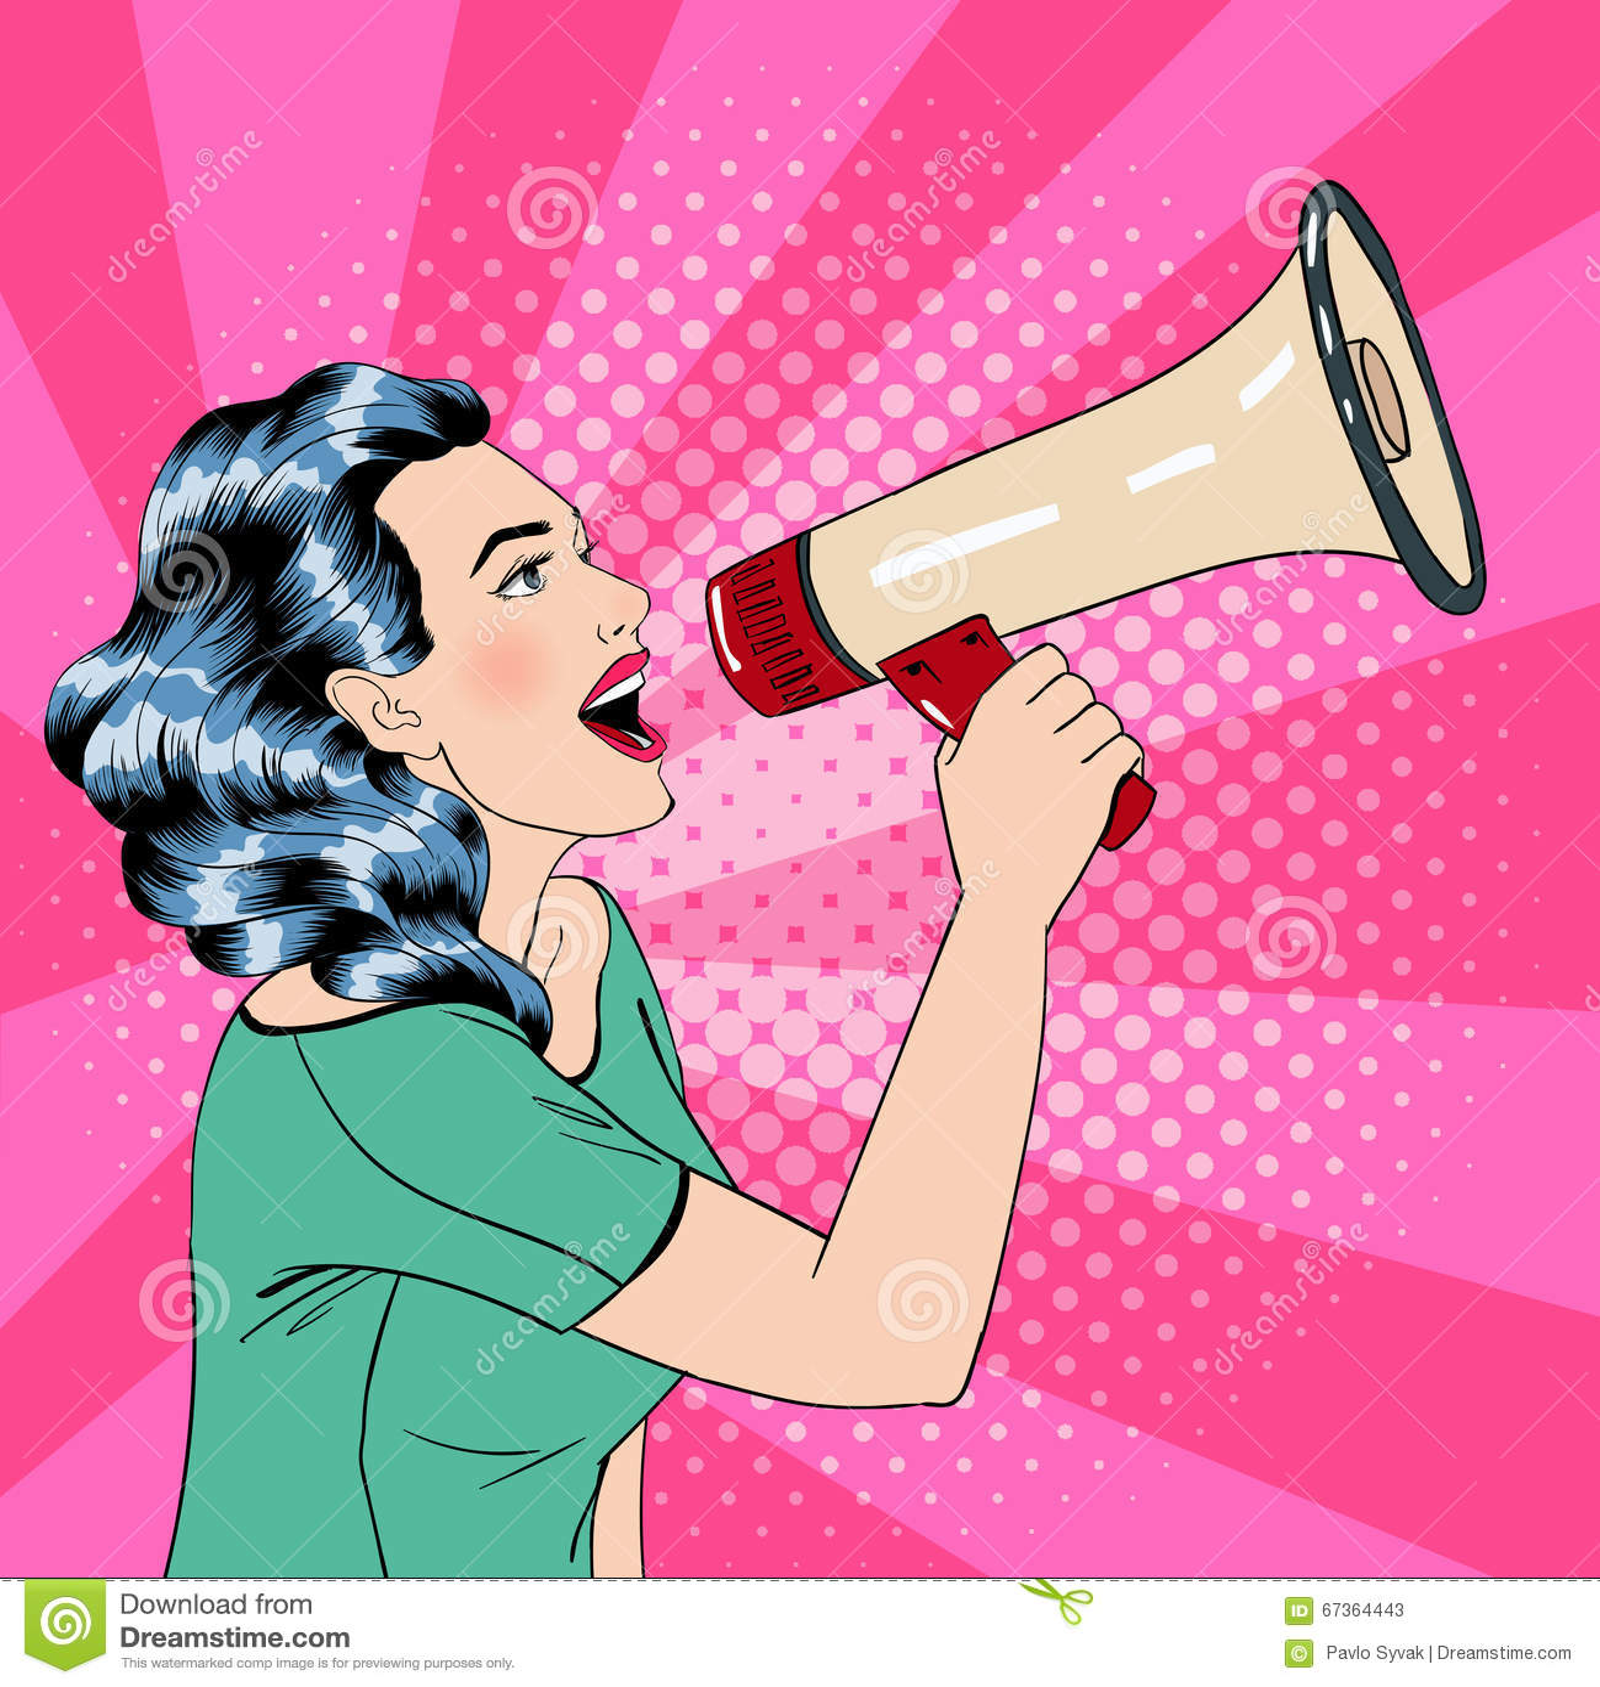 pop art style woman with megaphone illustration 67364443 megapixl